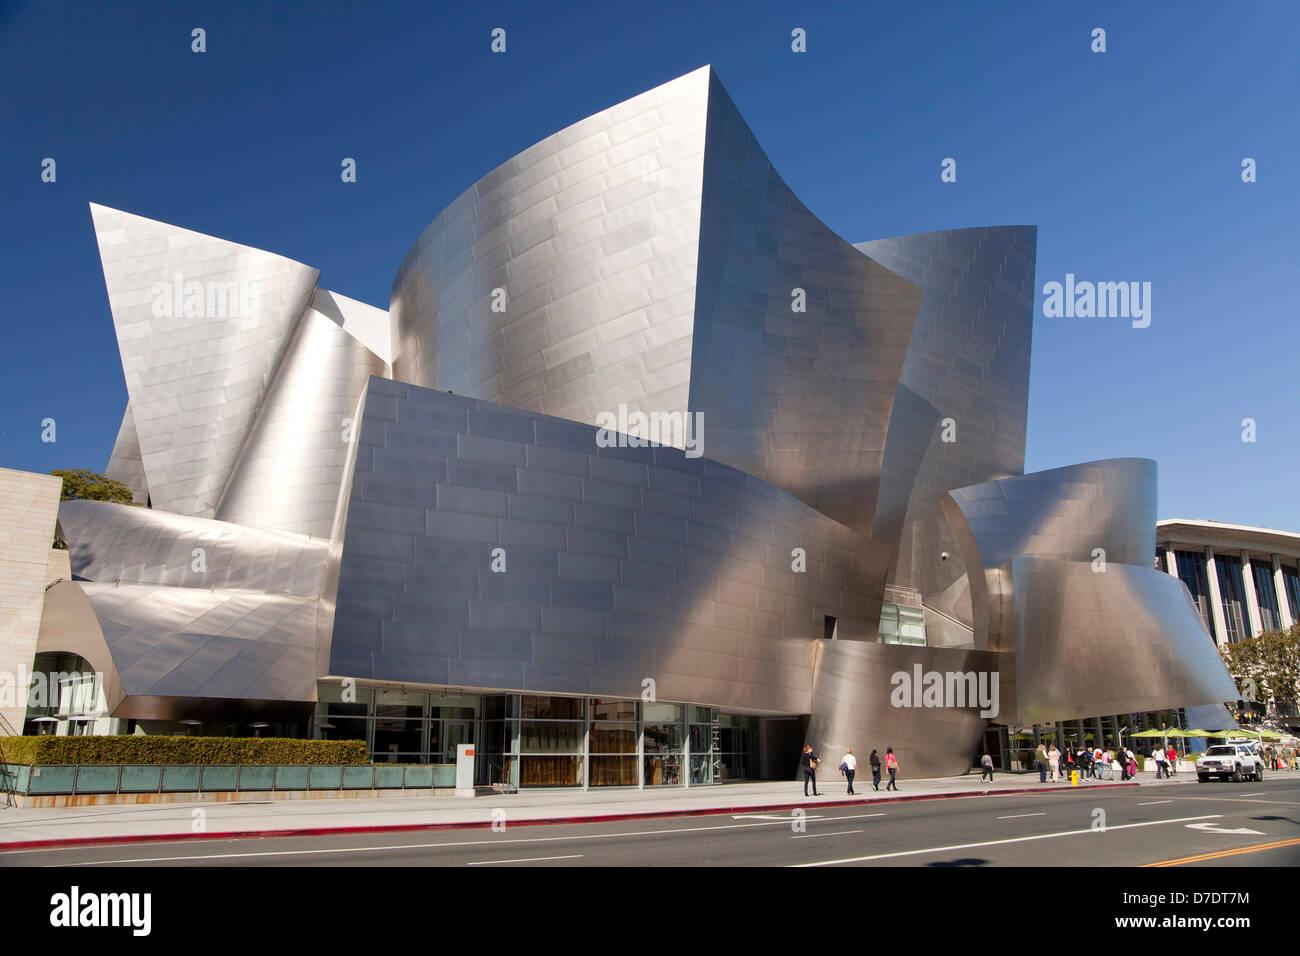 La moderna architettura di Frank Gehry, Walt Disney Concert Hall di Los Angeles, California, Stati Uniti d'America, Immagini Stock